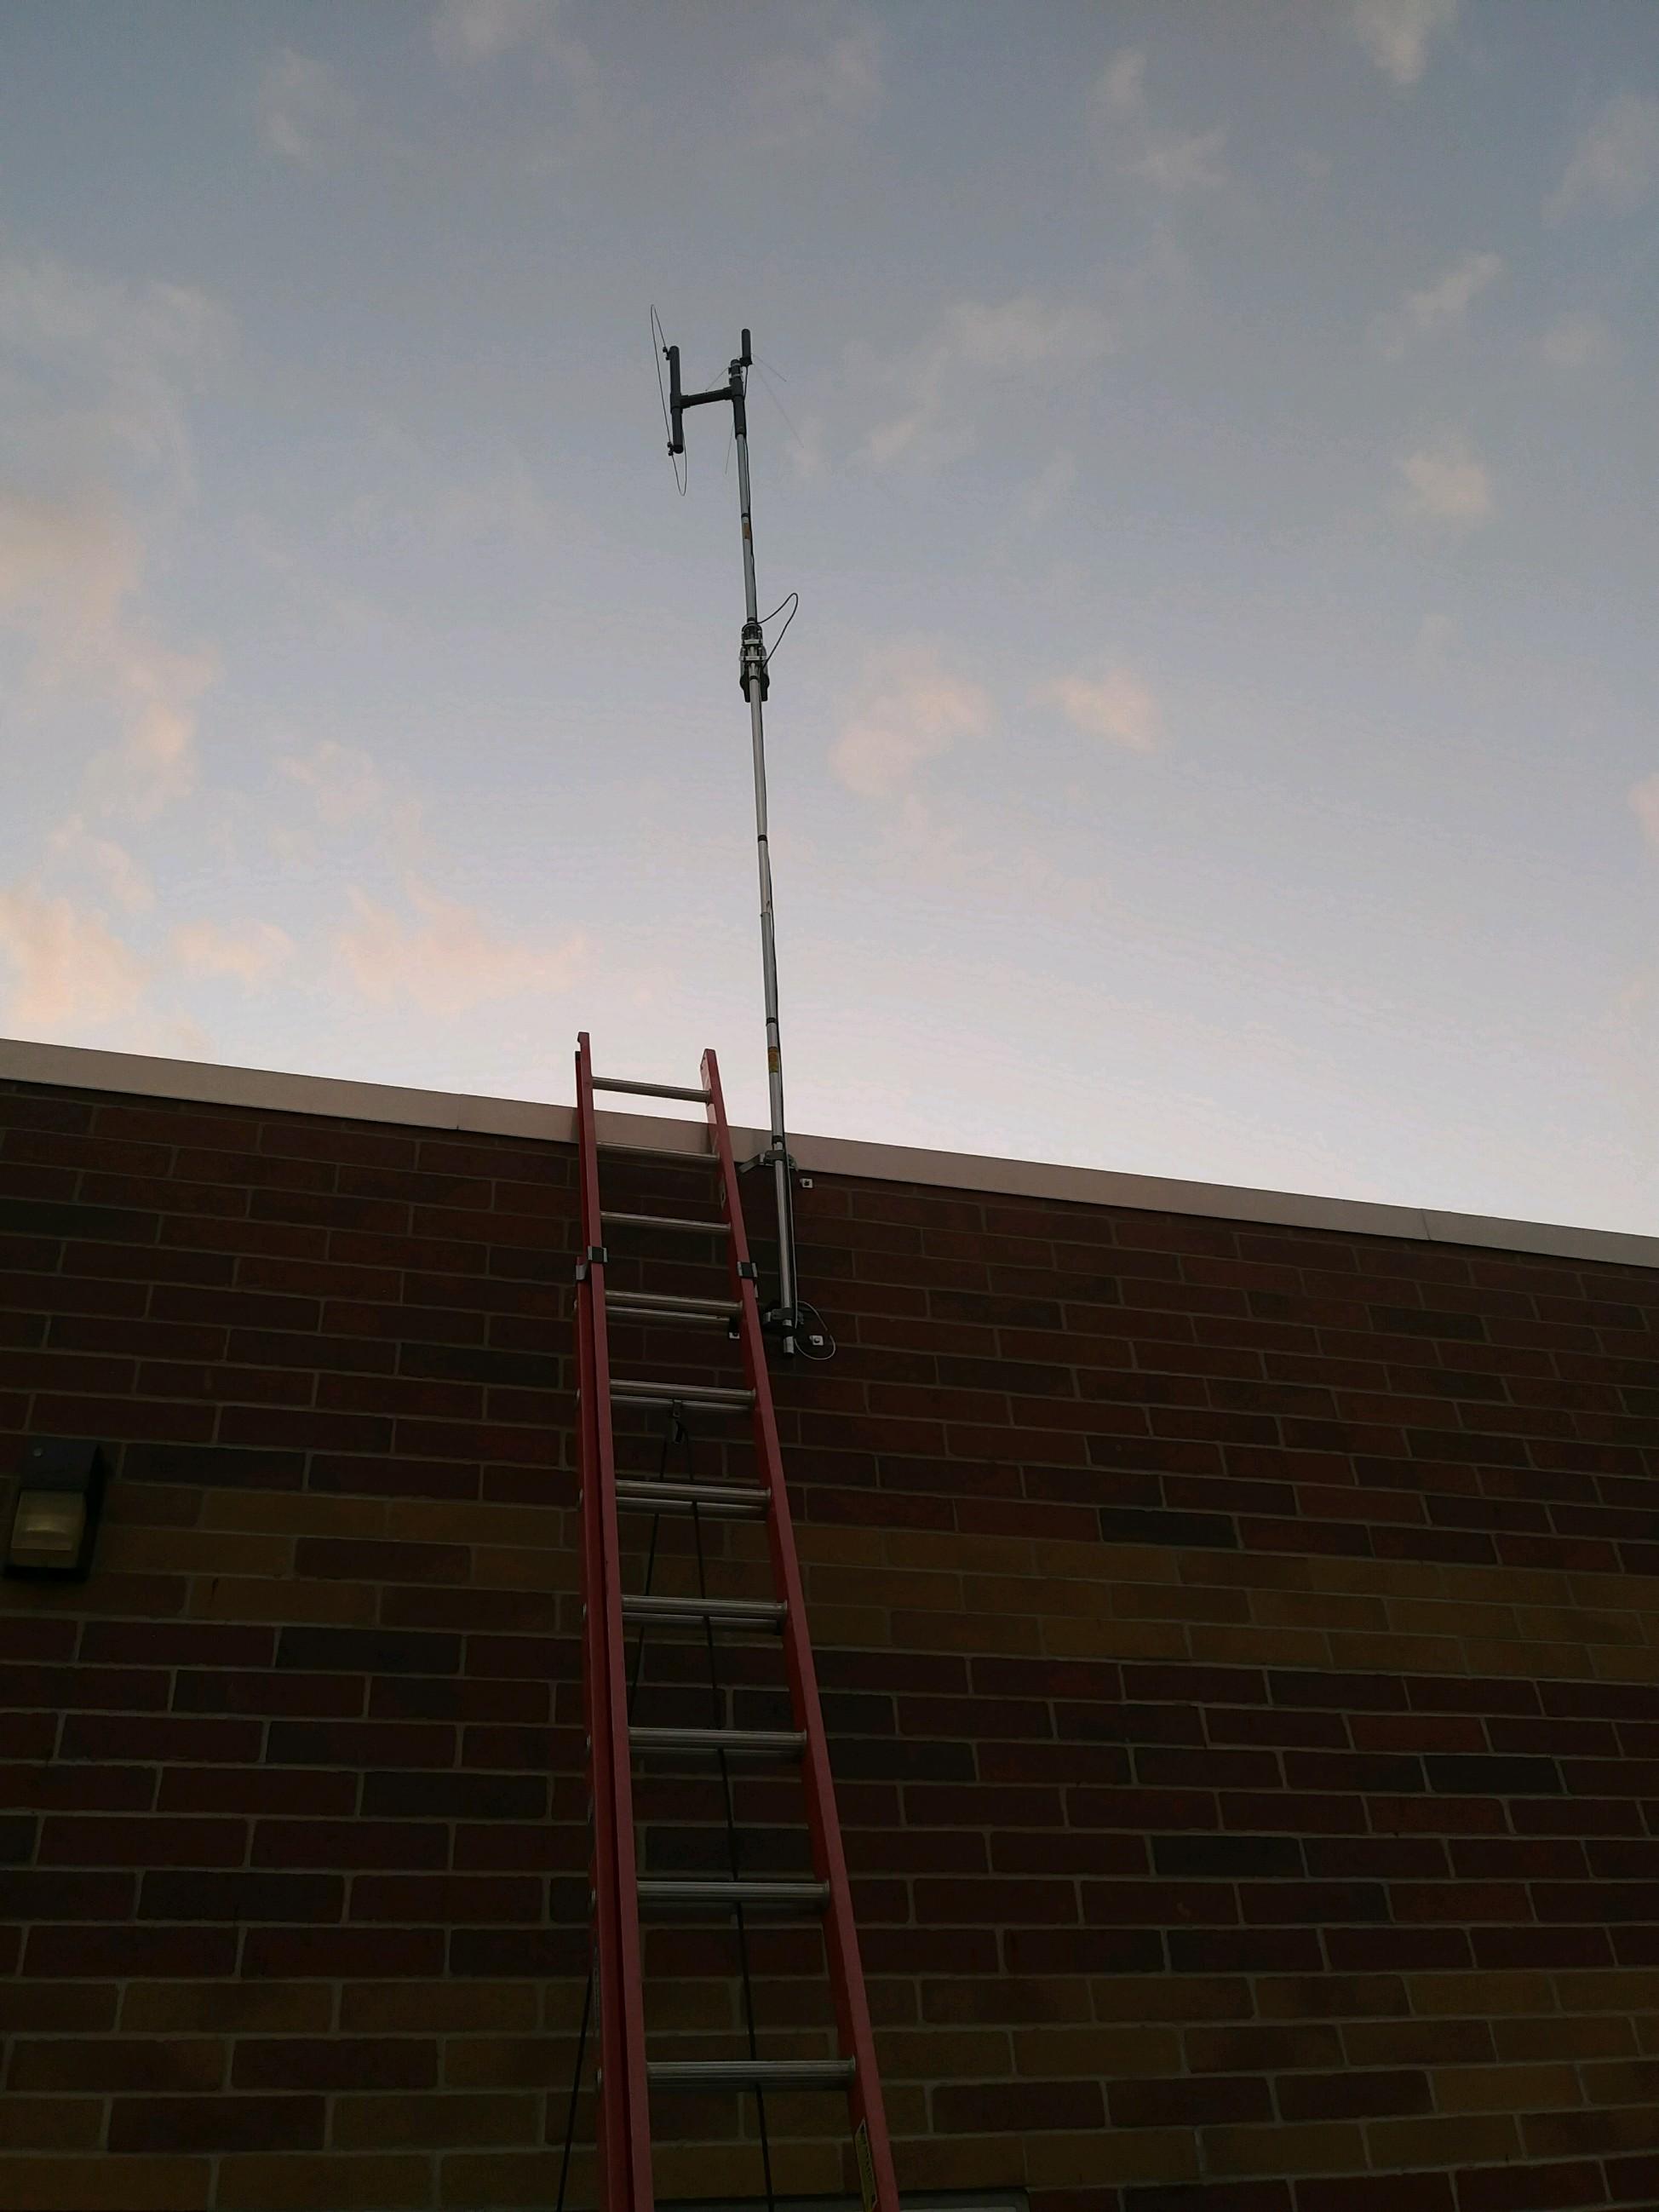 COMPACtenna 2 Meter micro-BEAM PHOTO at Heartland Radio